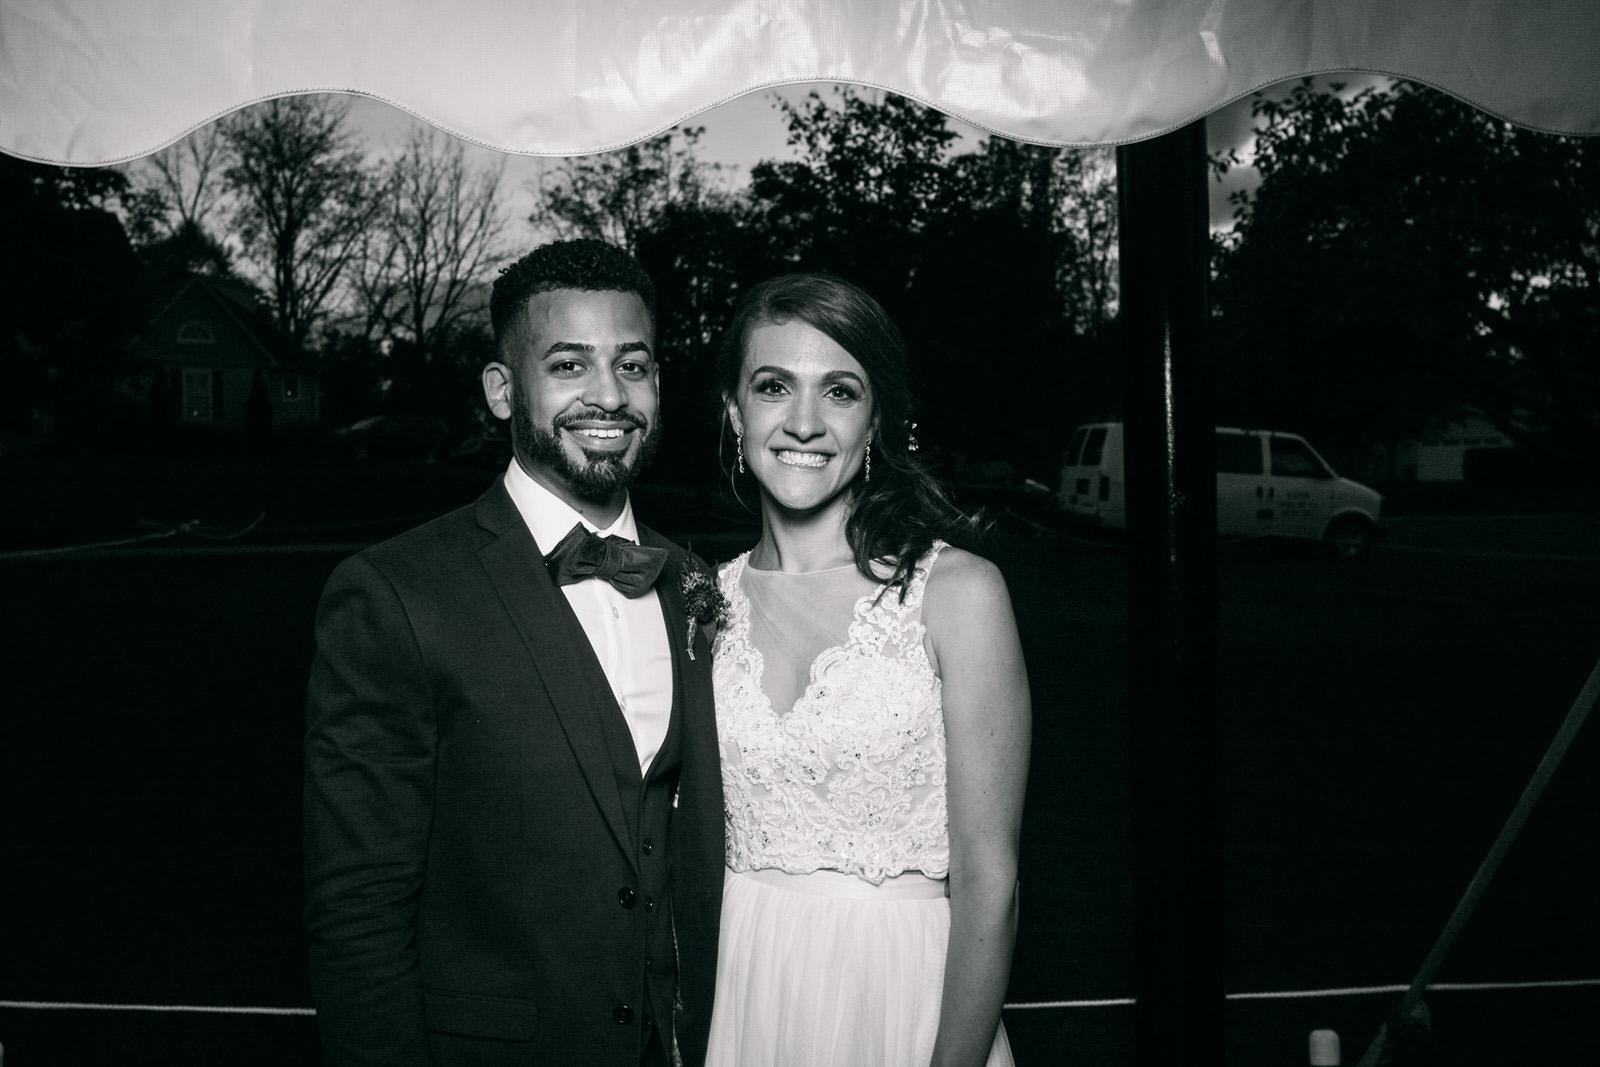 Kate-Andrew-Wedding-Photo-Booth-79.jpg